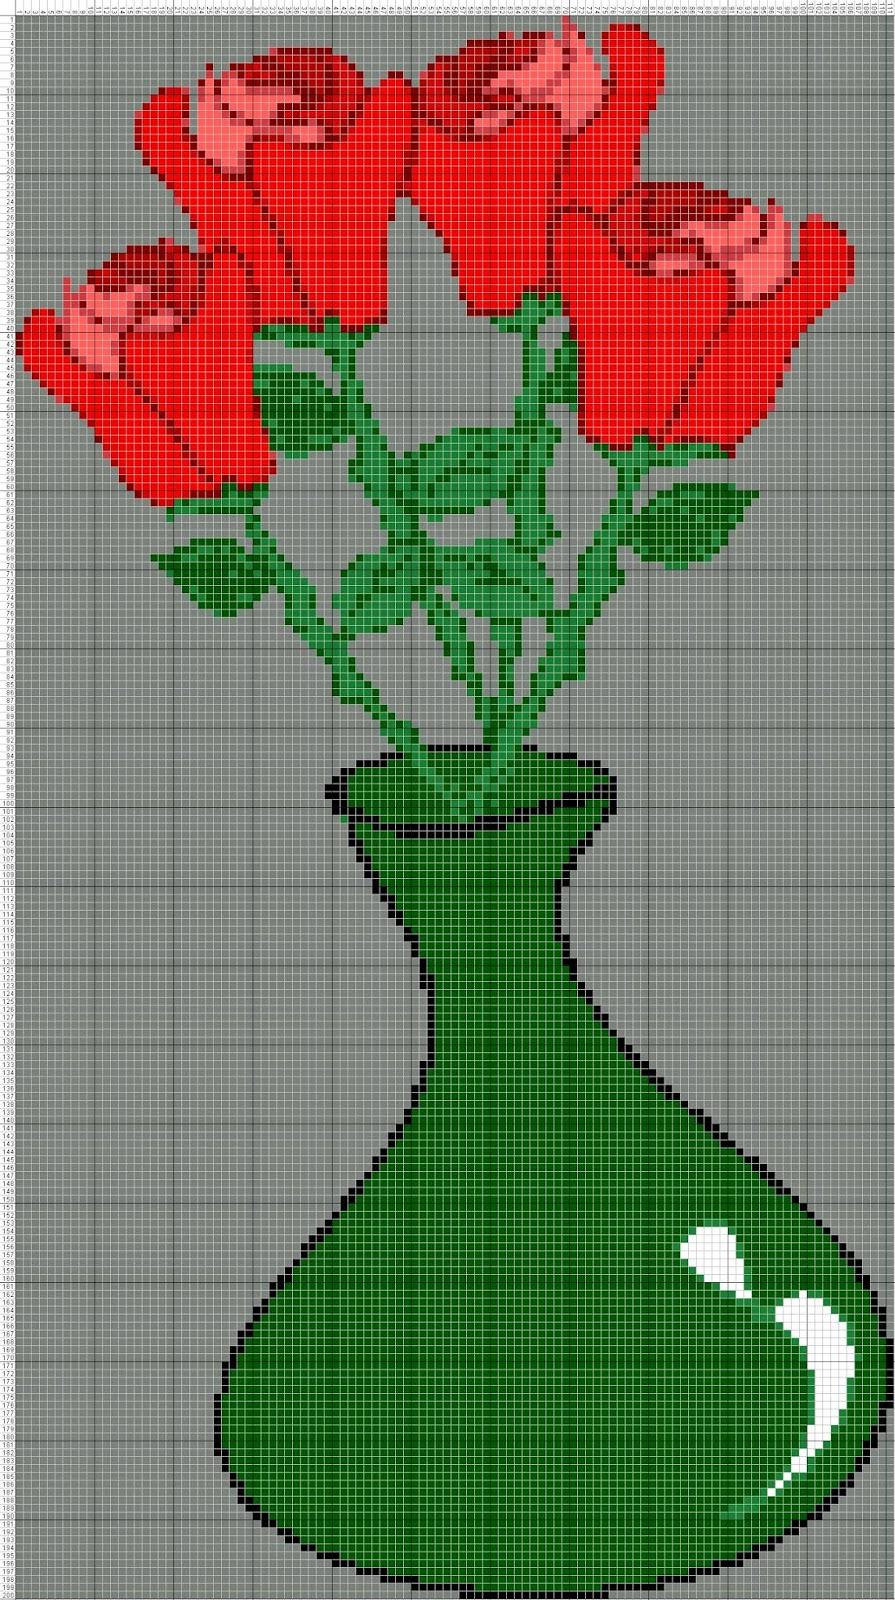 Gambar Pola Kristik Bunga Mawar Merah Dalam Vas